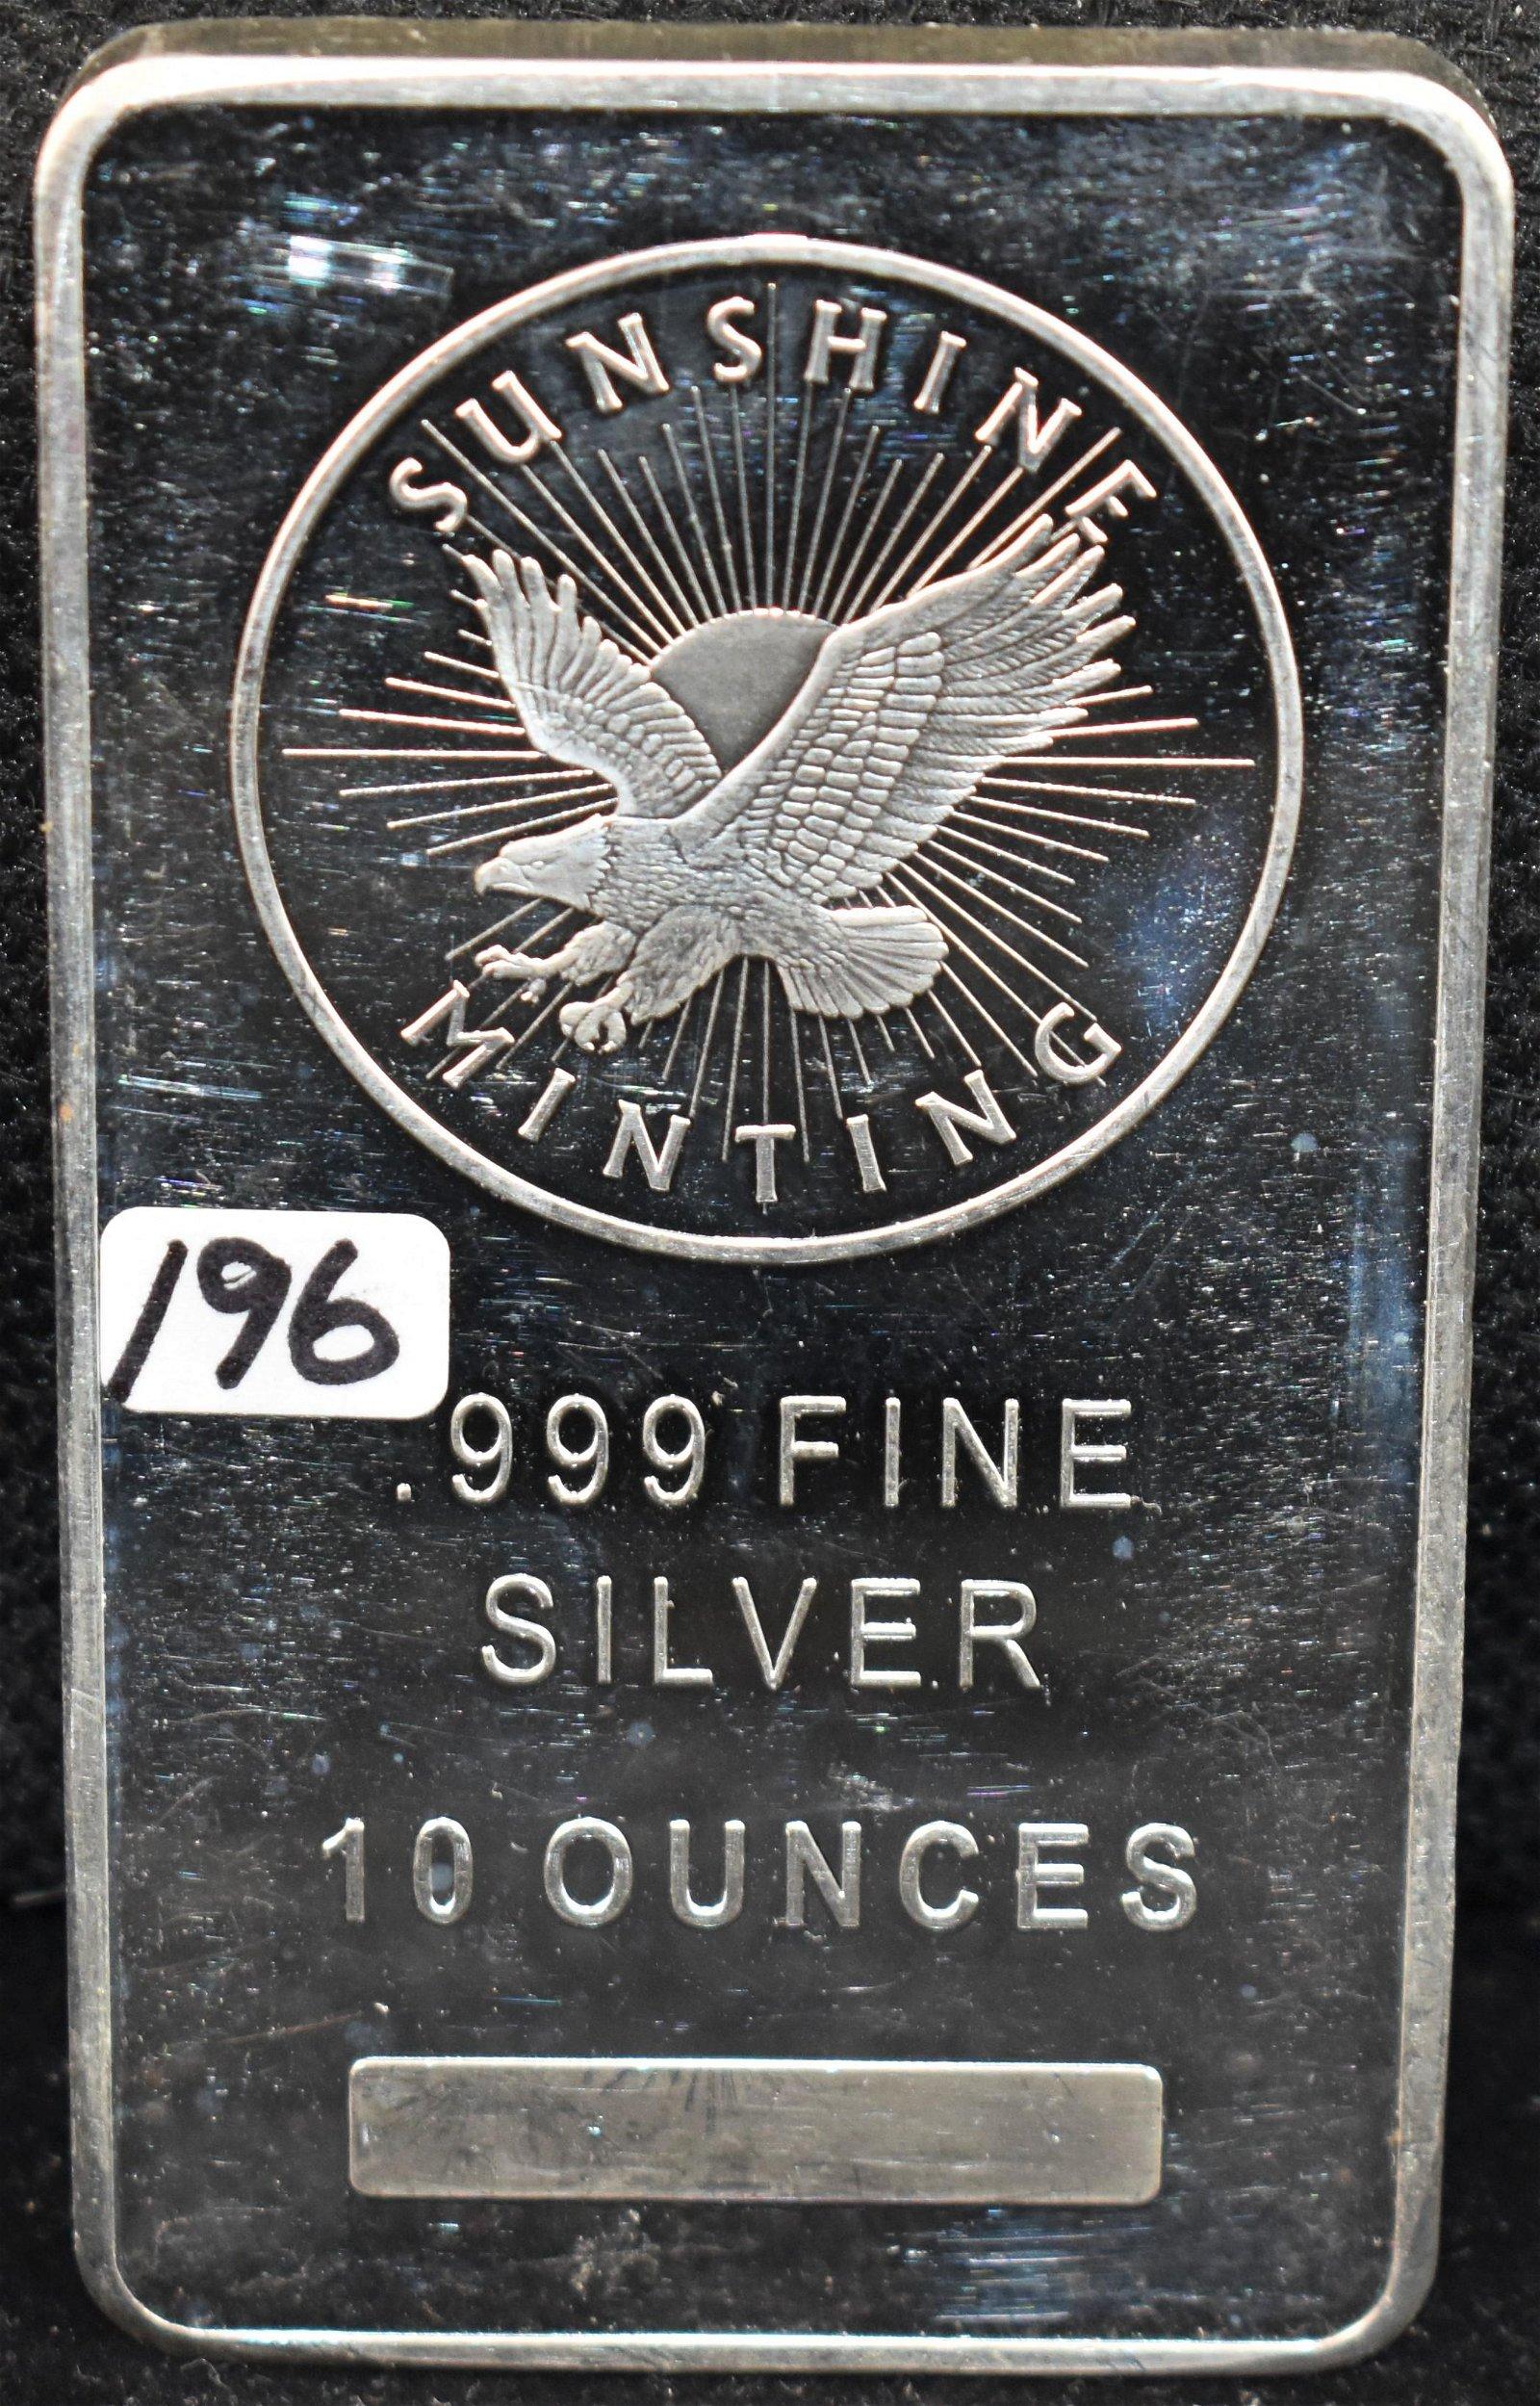 SUNSHINE MINTING 10 TROY OZ 999 FINE SILVER INGOT